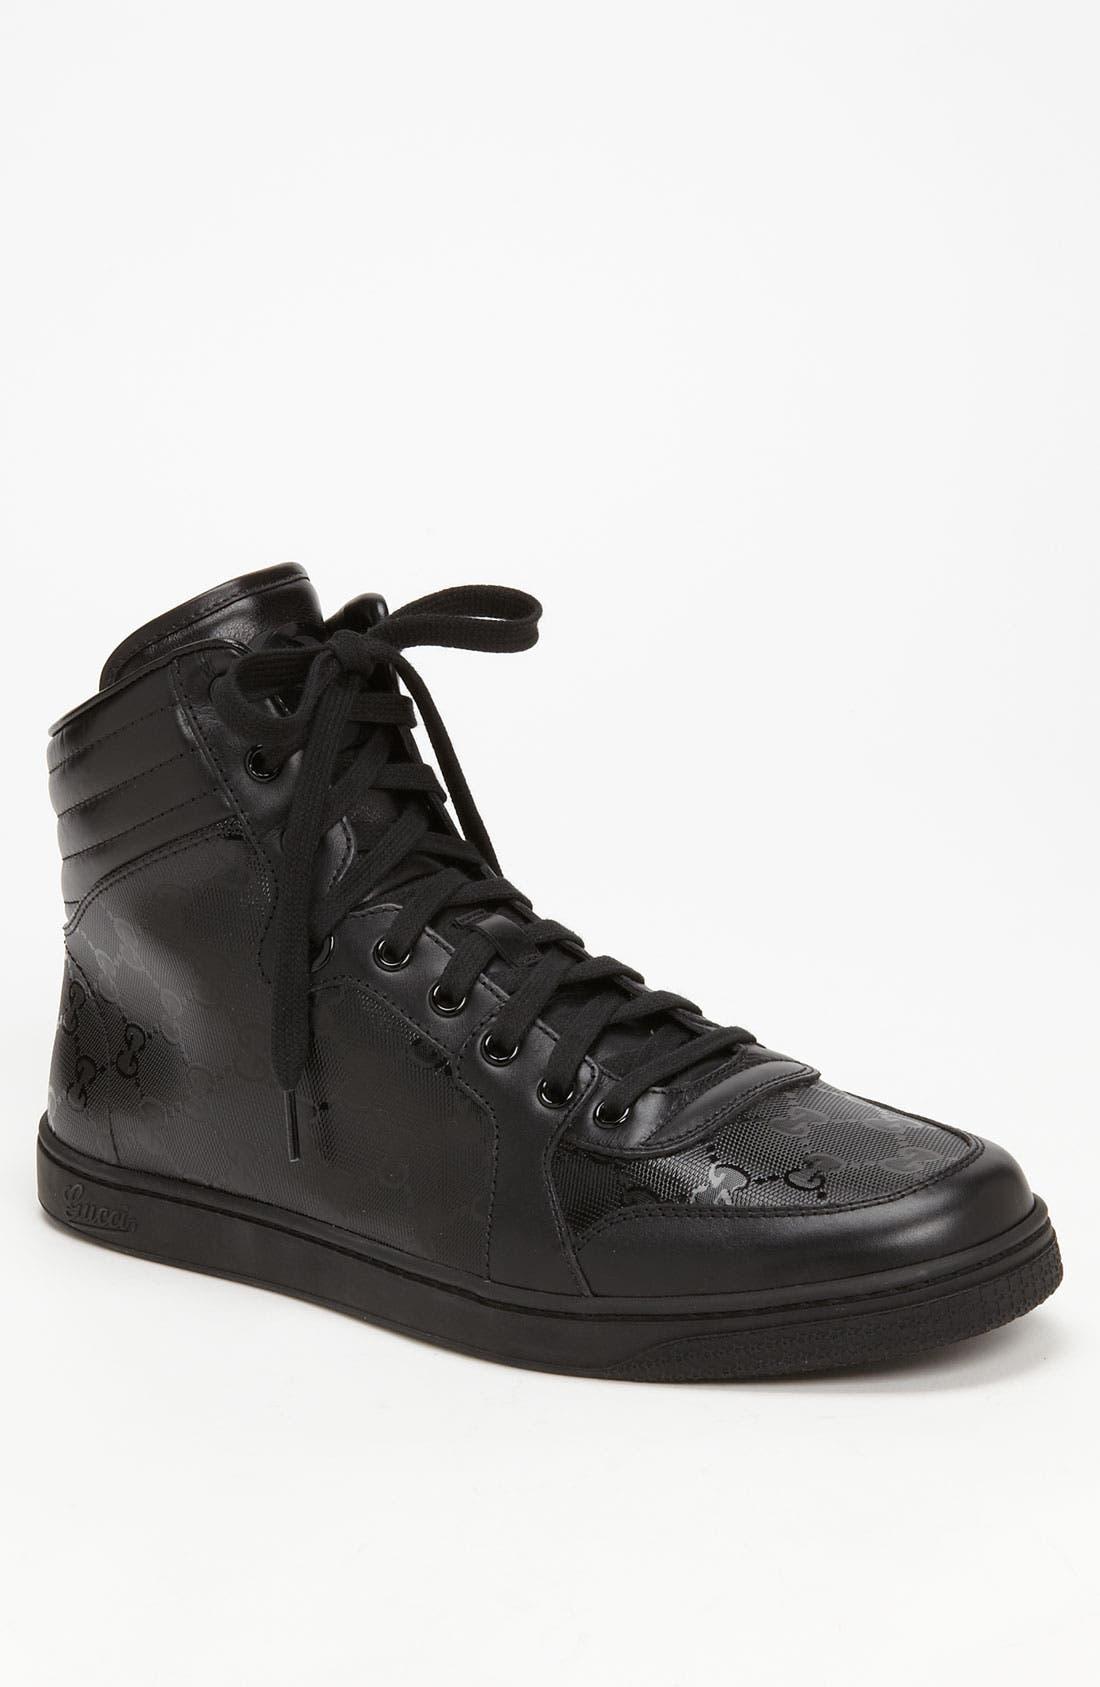 Alternate Image 1 Selected - Gucci 'Coda' High Top Sneaker